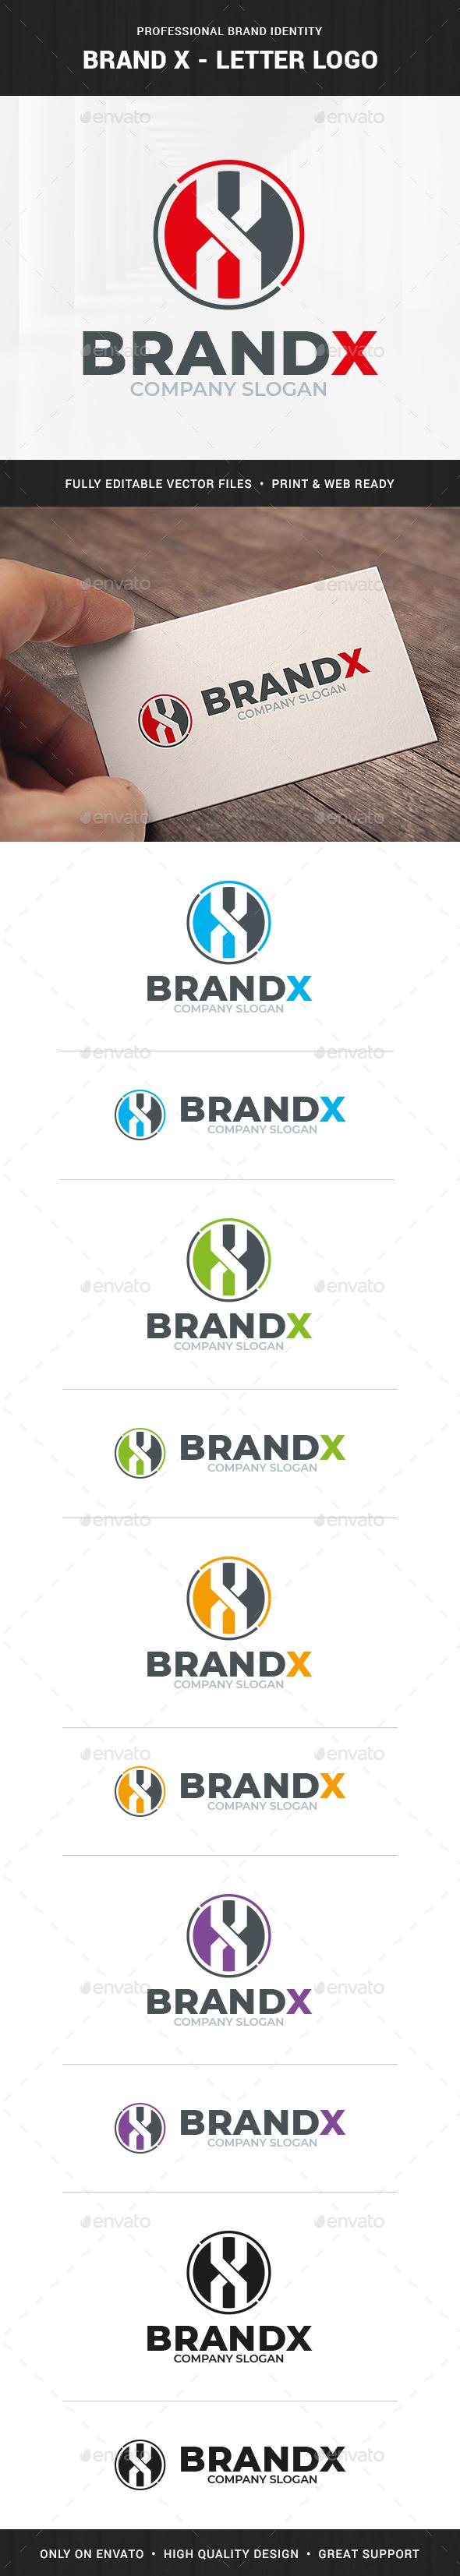 Brand X - Letter Logo Template